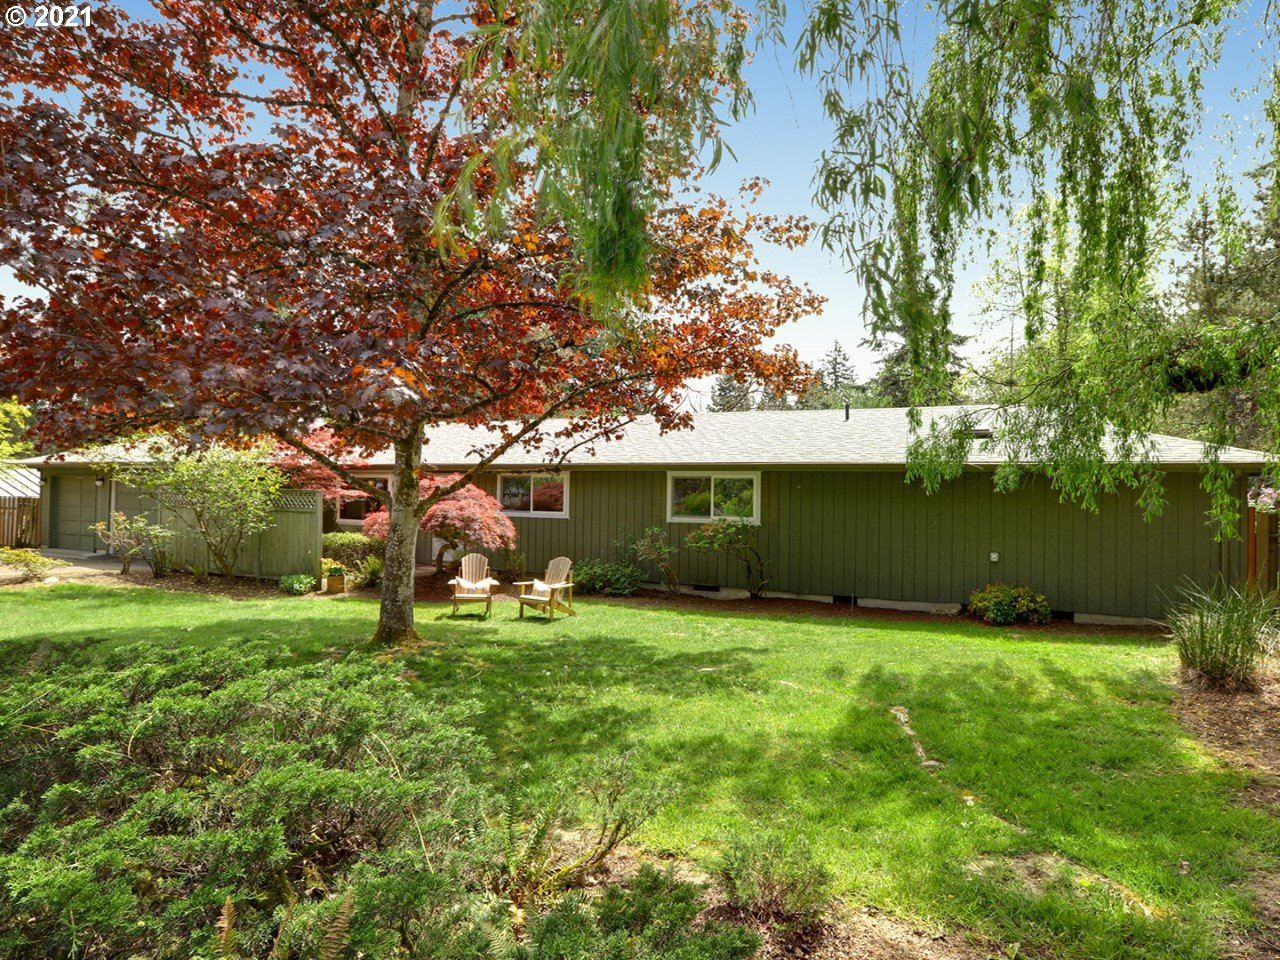 1386 SW TAYLORS FERRY CT, Portland, OR 97219 - MLS#: 21378907